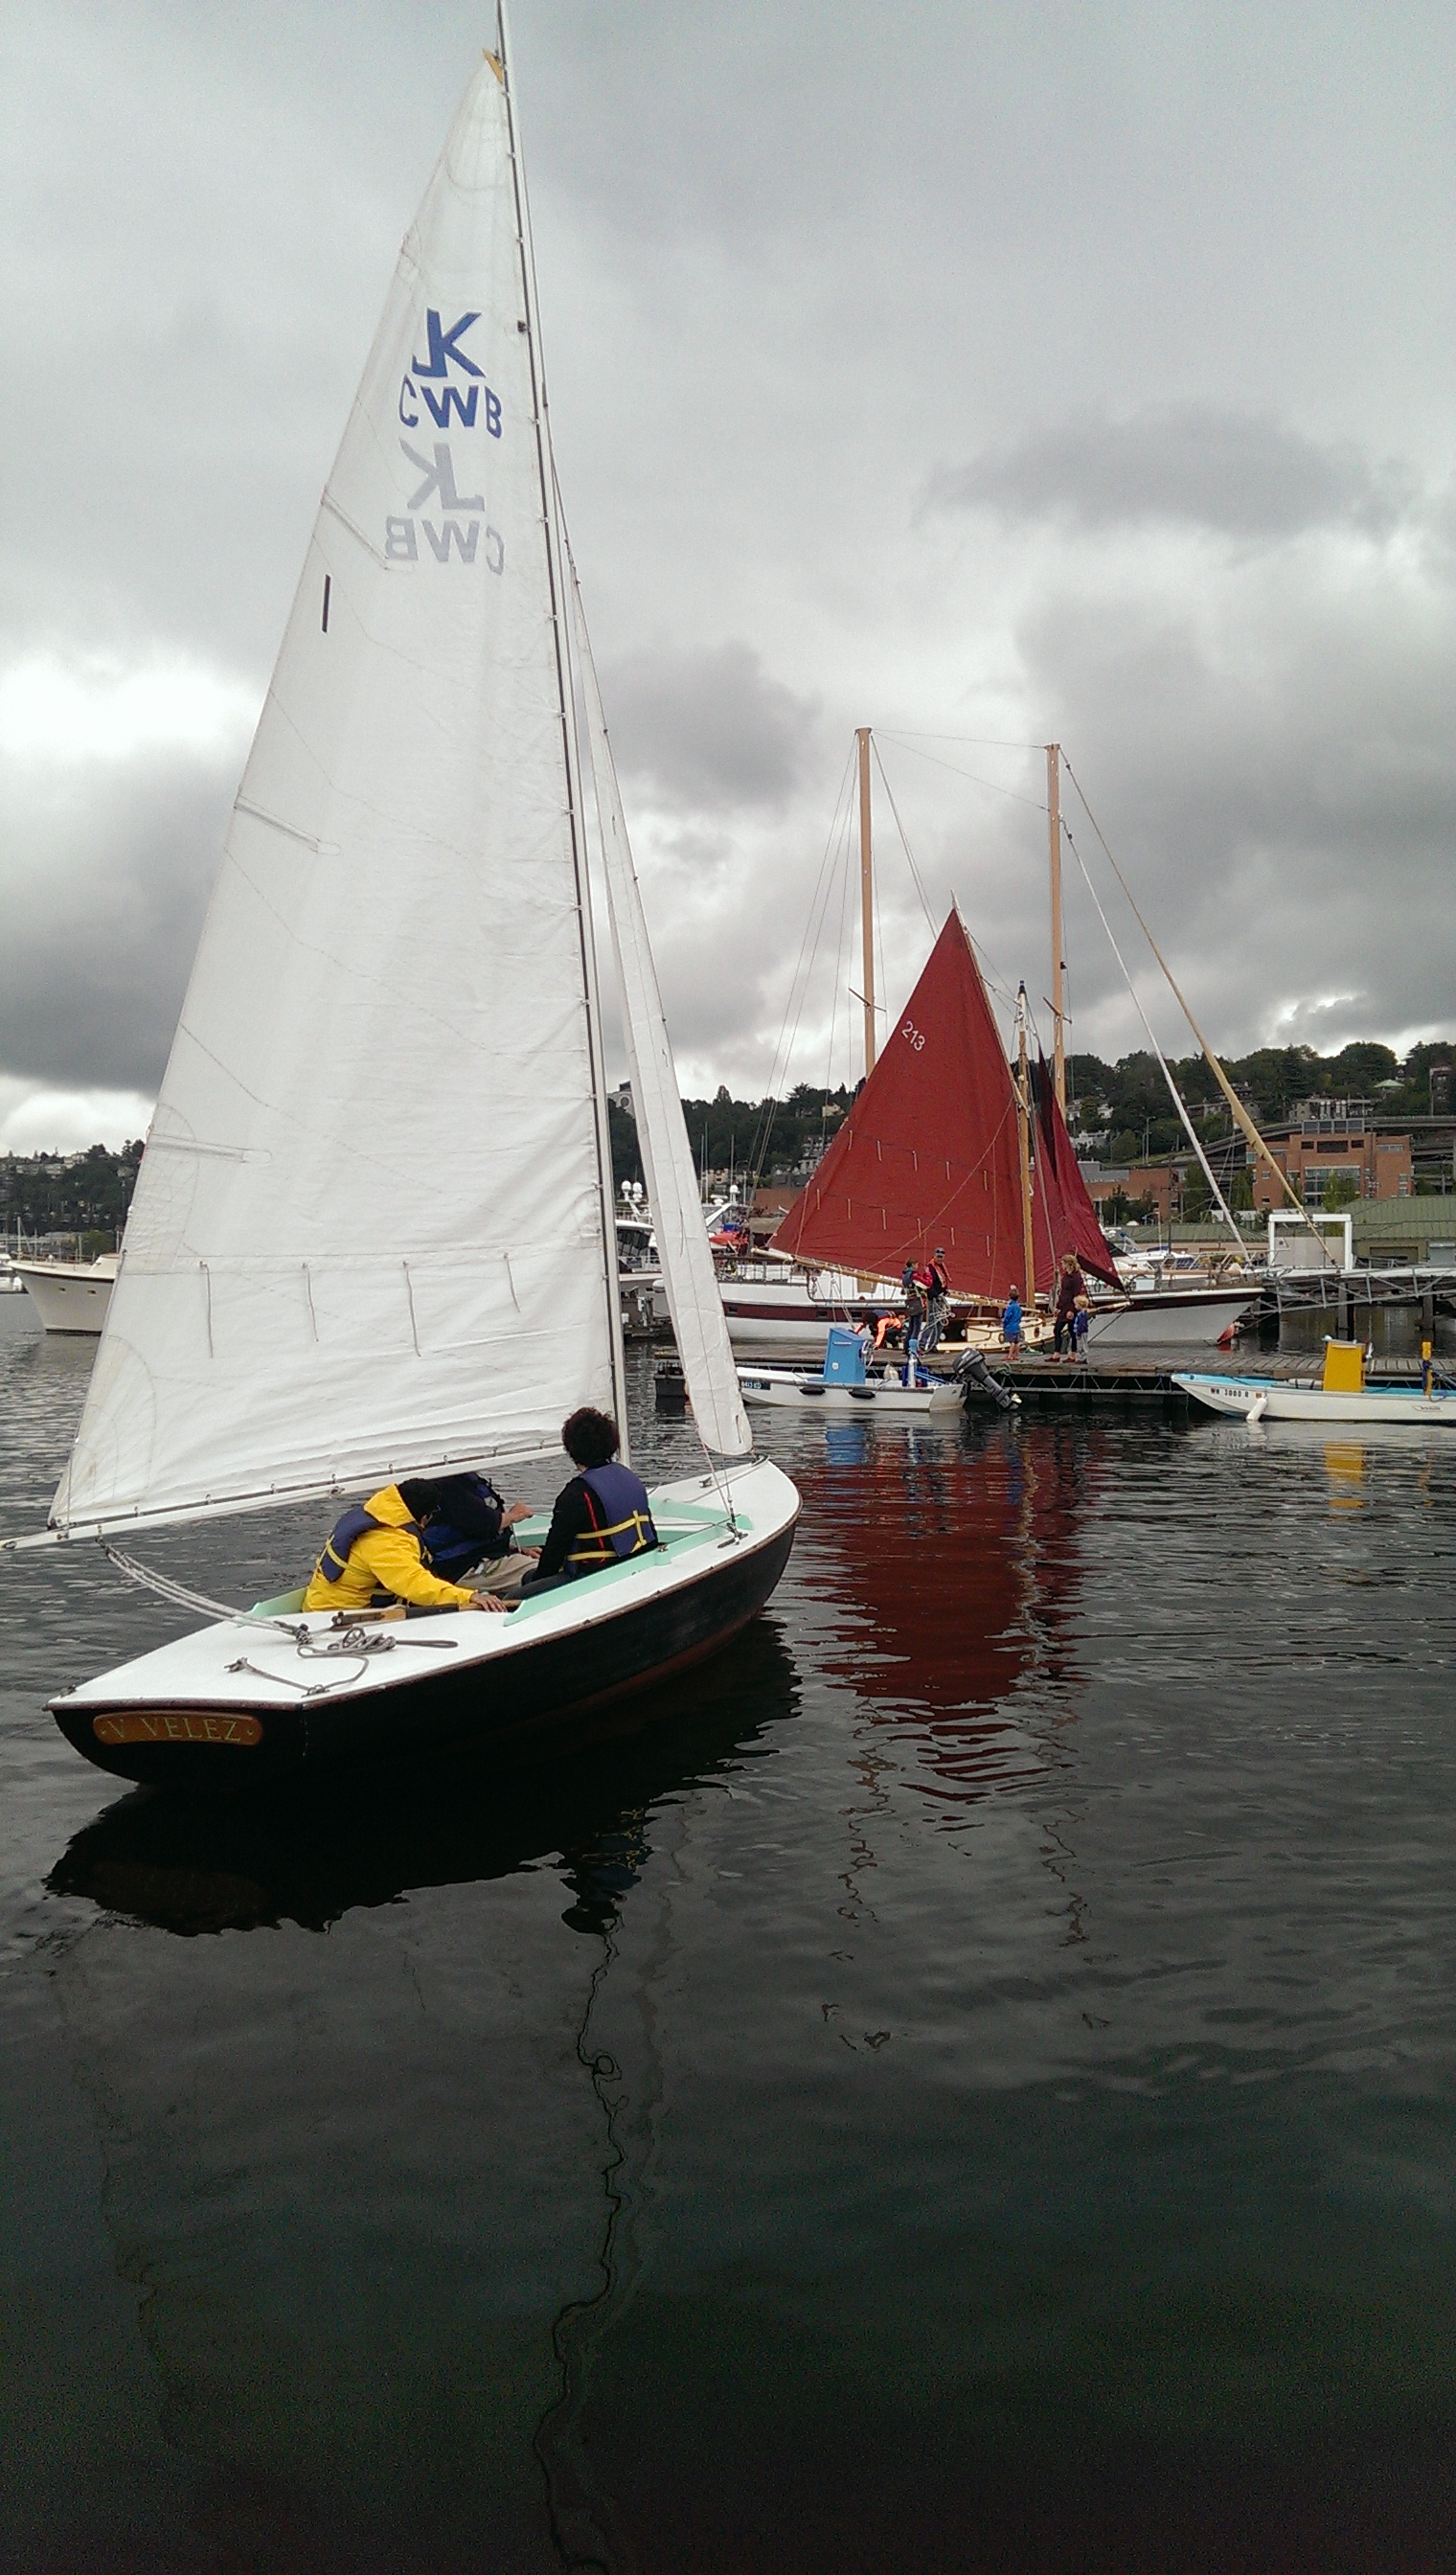 22 - Sail Boats - Amie on right